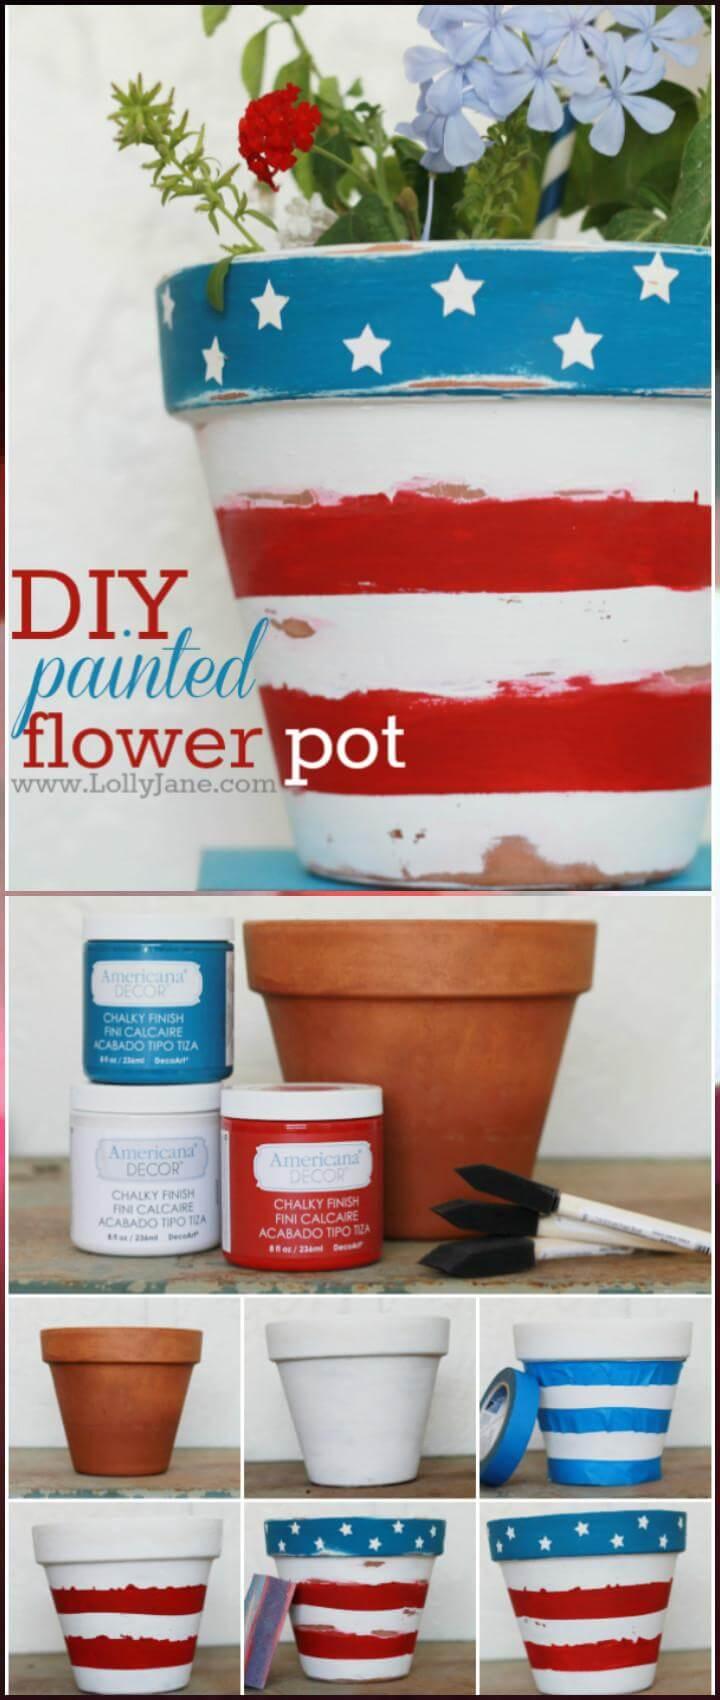 24 DIY Painted Patriotic Flower Pot